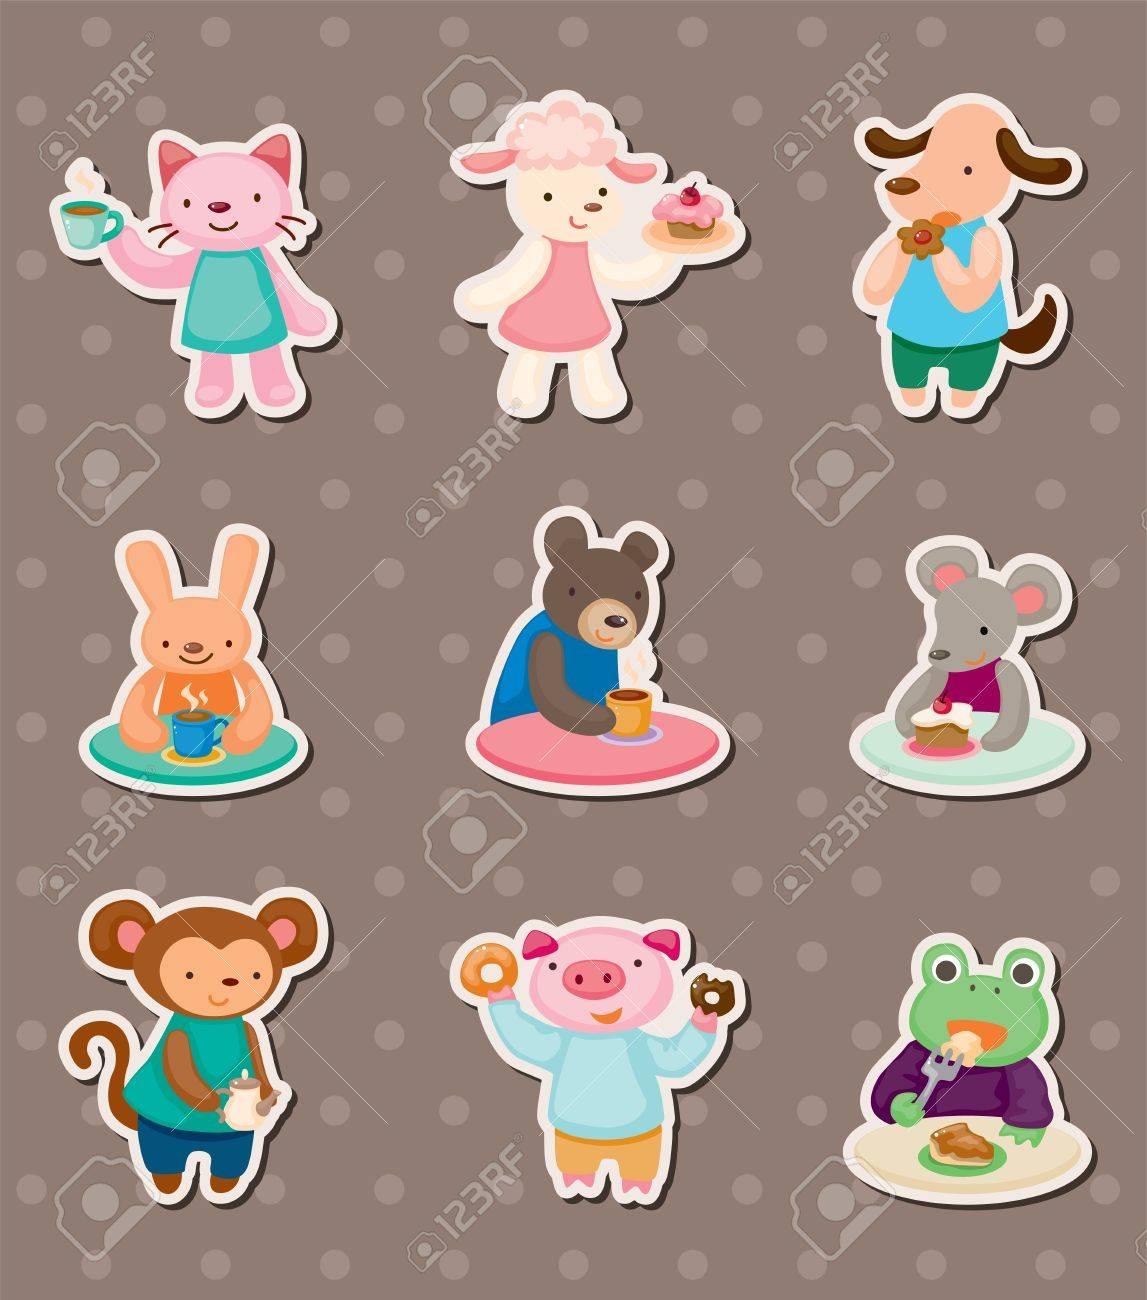 animal tea time stickers Stock Vector - 14091863